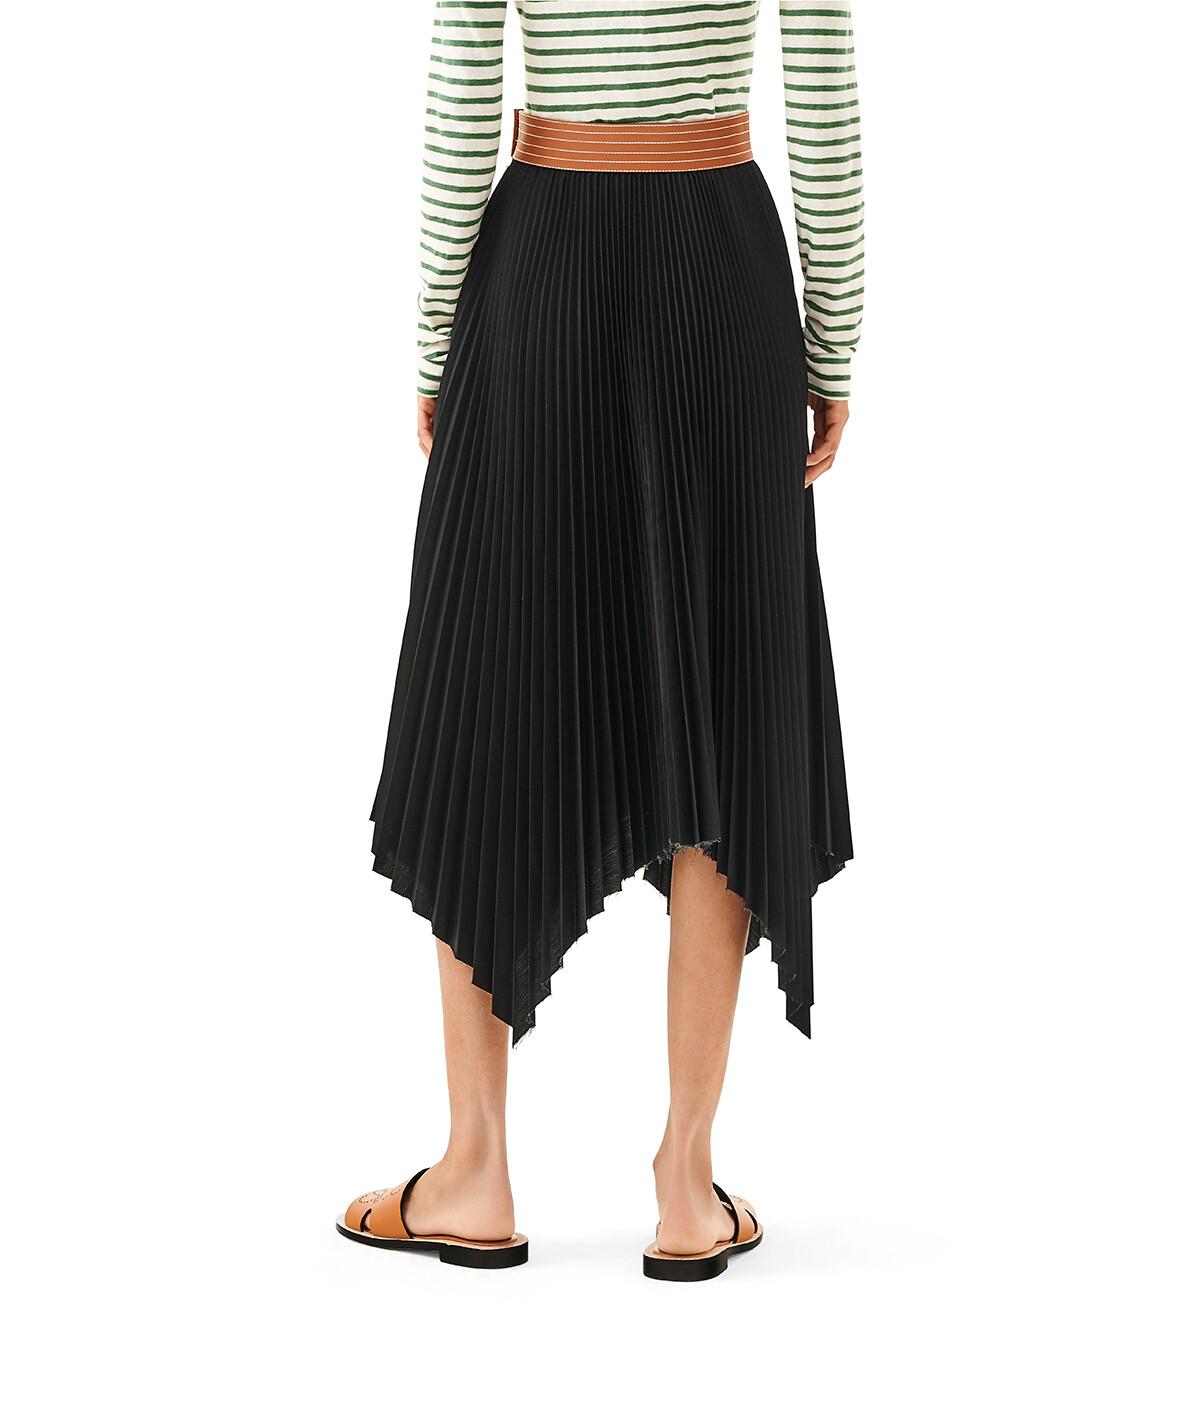 LOEWE Pleated Skirt 黑色/棕褐色 front